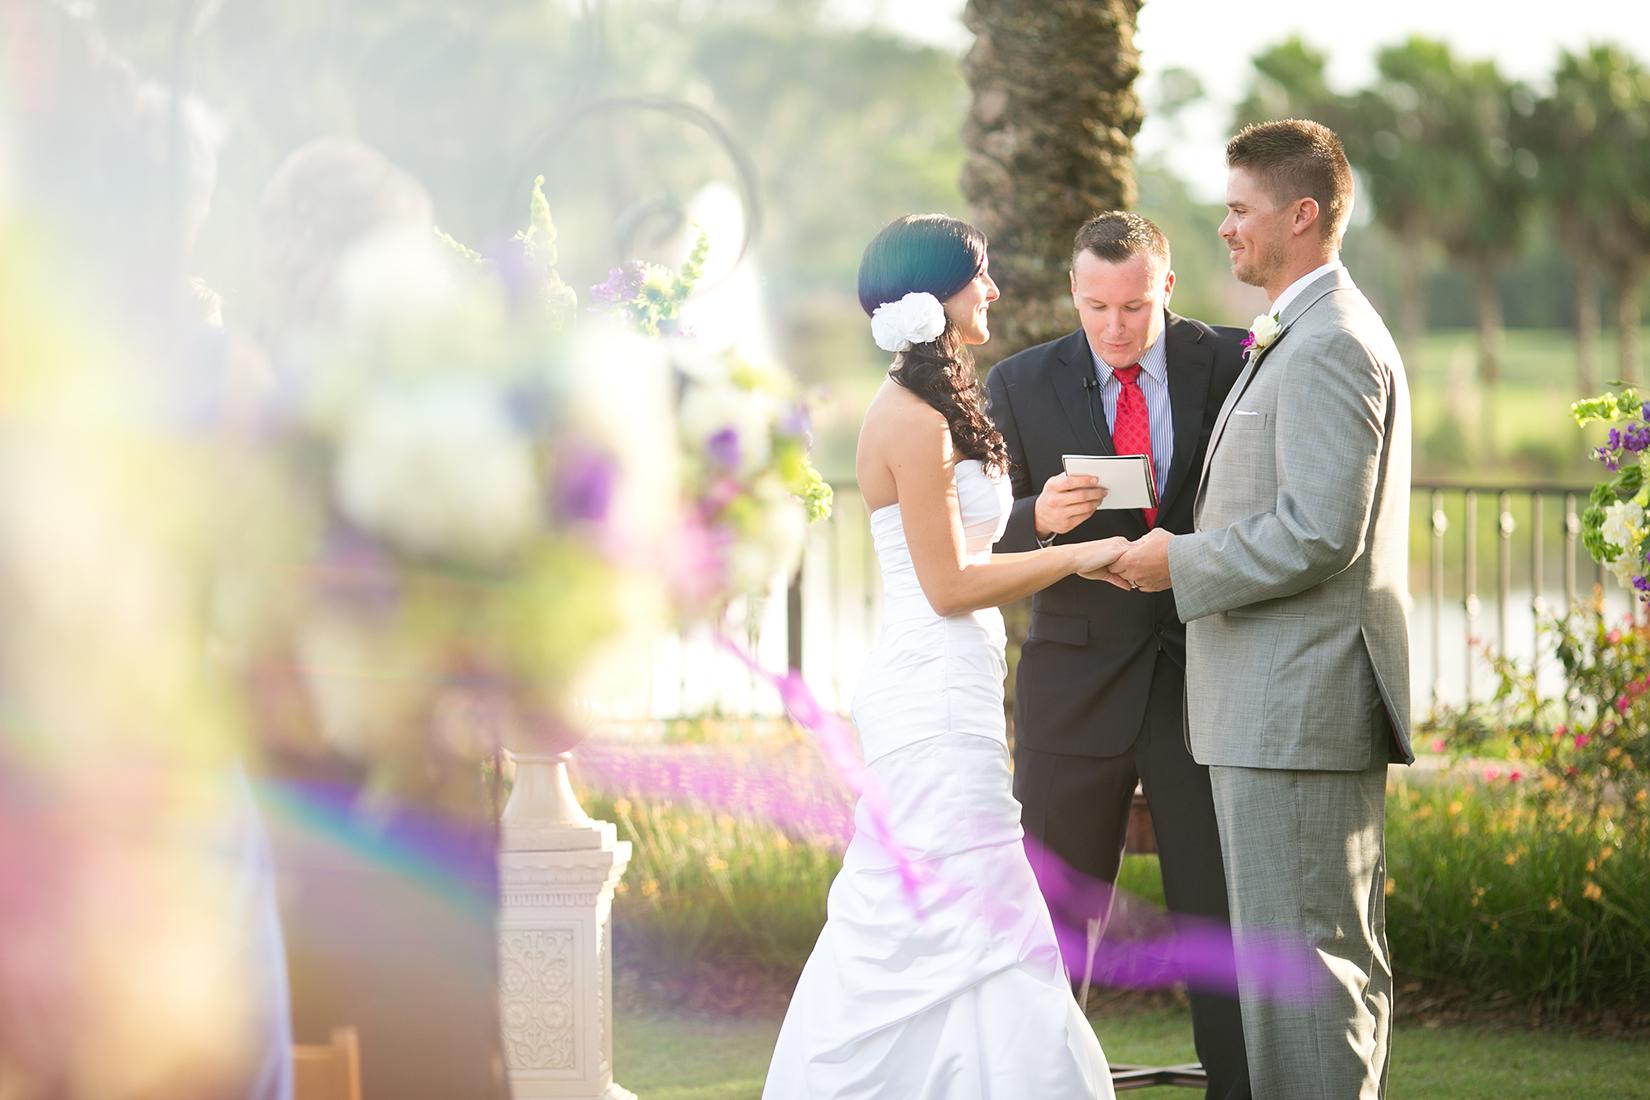 adam-szarmack-tpc-sawgrass-ponte-vedra-wedding-photographer-PZ3A9627.jpg